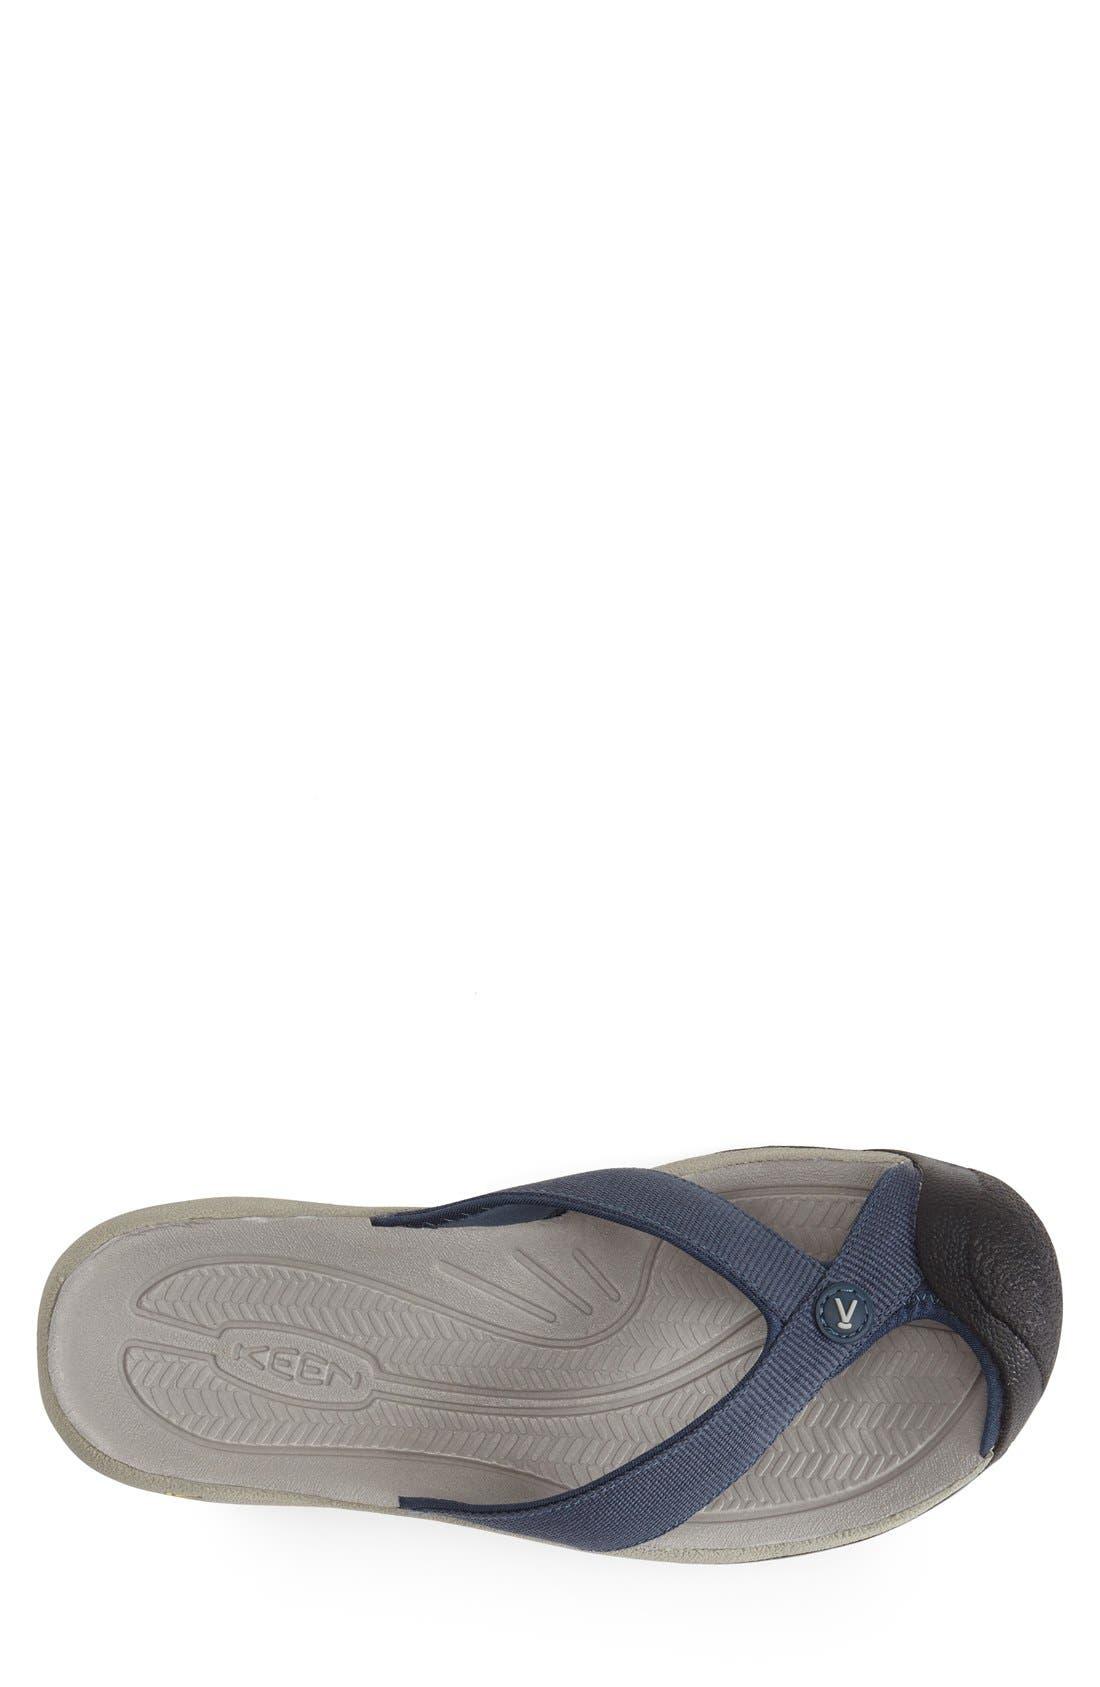 'Waimea H2' Water Thong Sandal,                             Alternate thumbnail 2, color,                             MIDNIGHT NAVY/ NEUTRAL